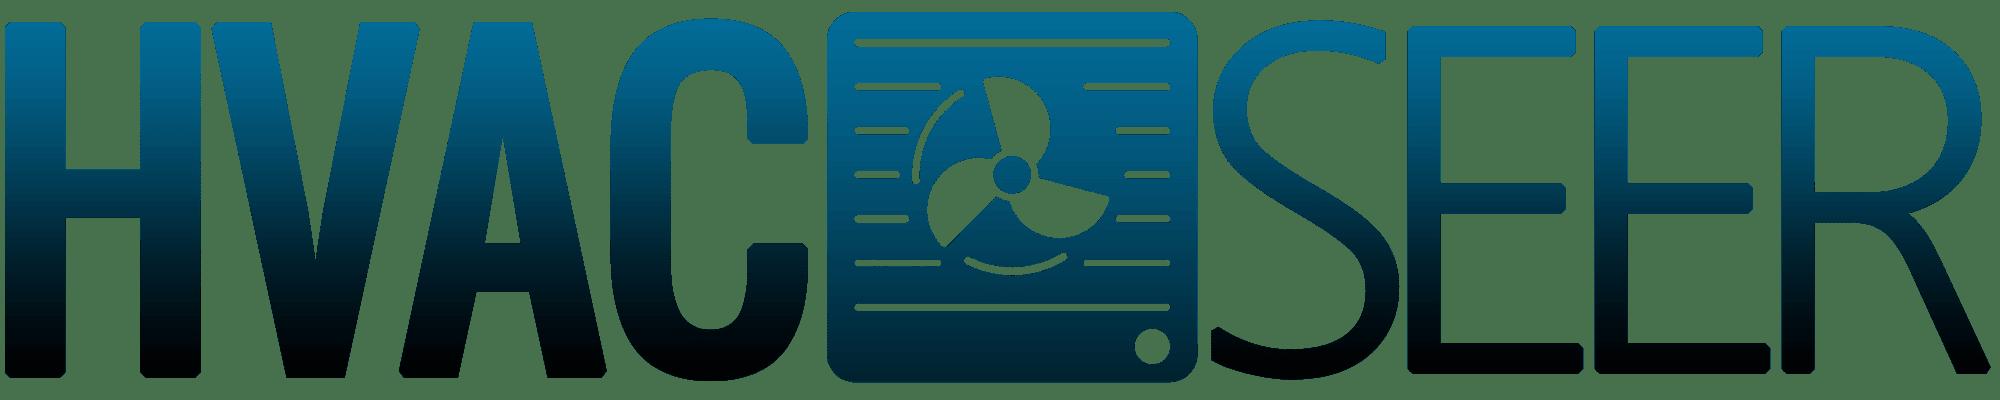 HVAC Seer logo